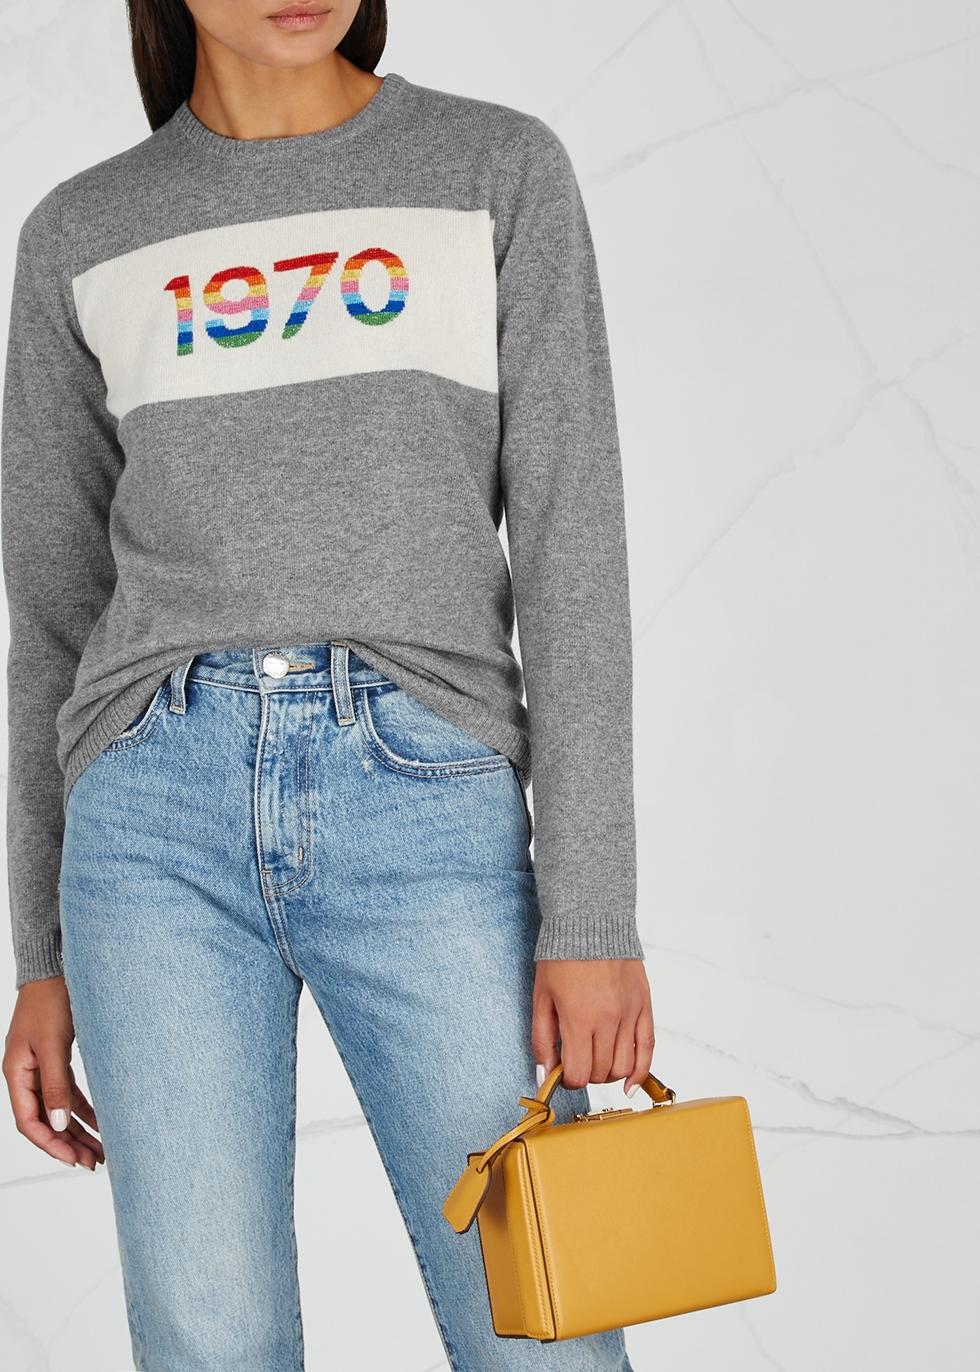 Bella Freud 1970 cashmere blend jumper Harvey Nichols